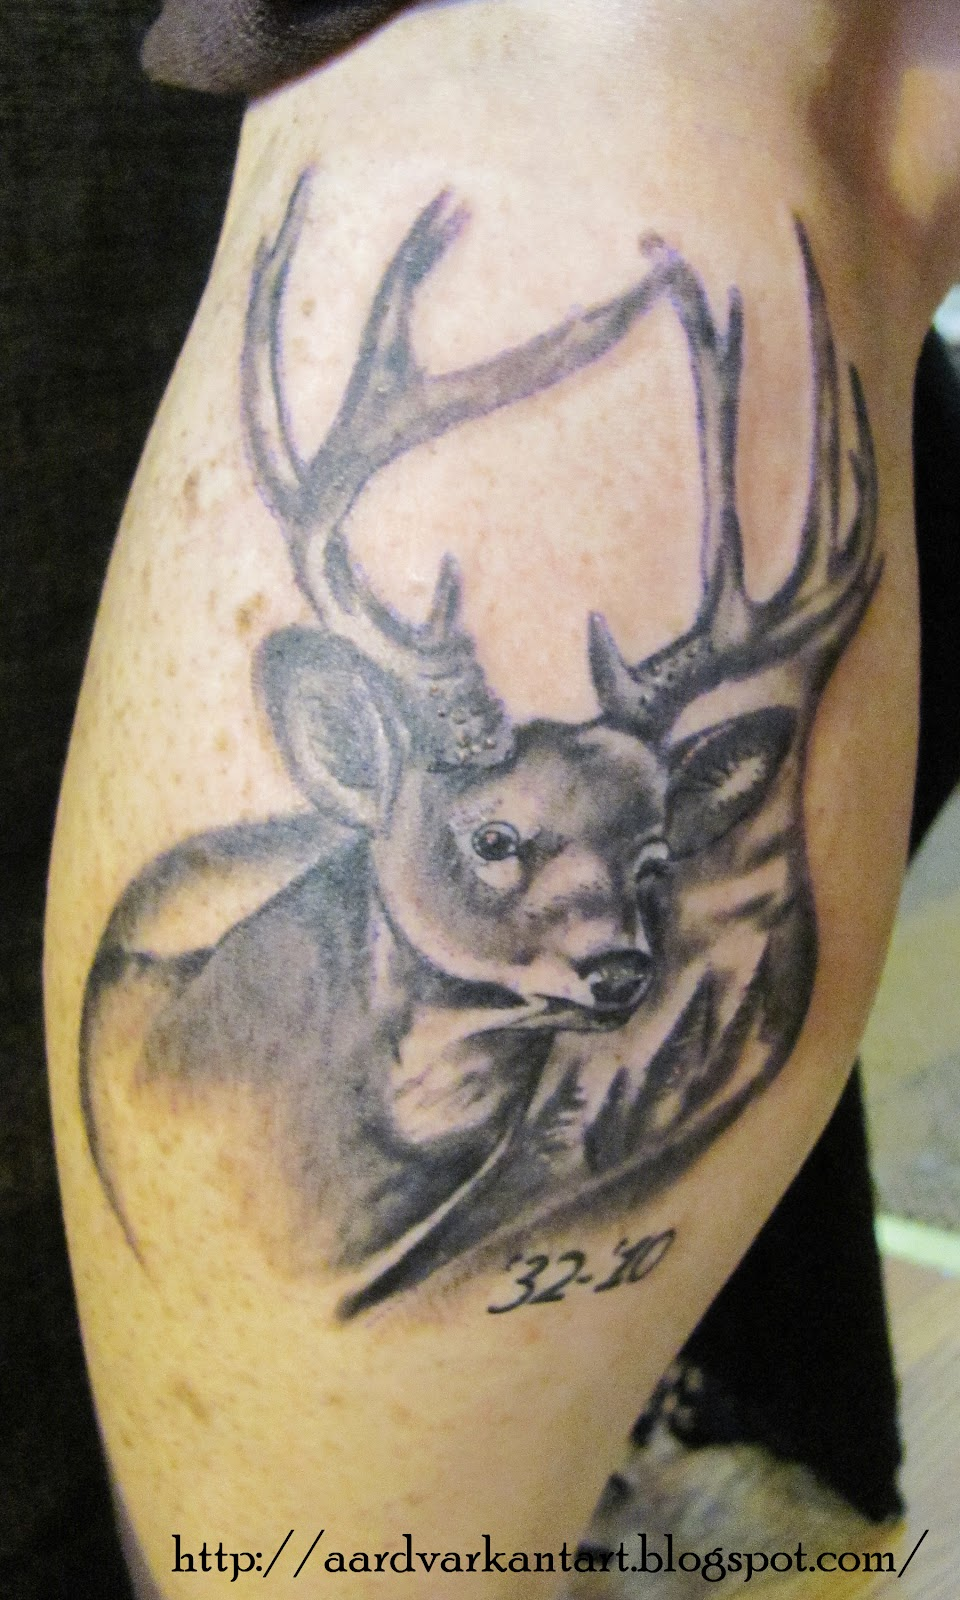 def58bbb3 Deer Calf Tattoo Jackalope Tattoo Claddagh Tattoo Navy Diver Helmet